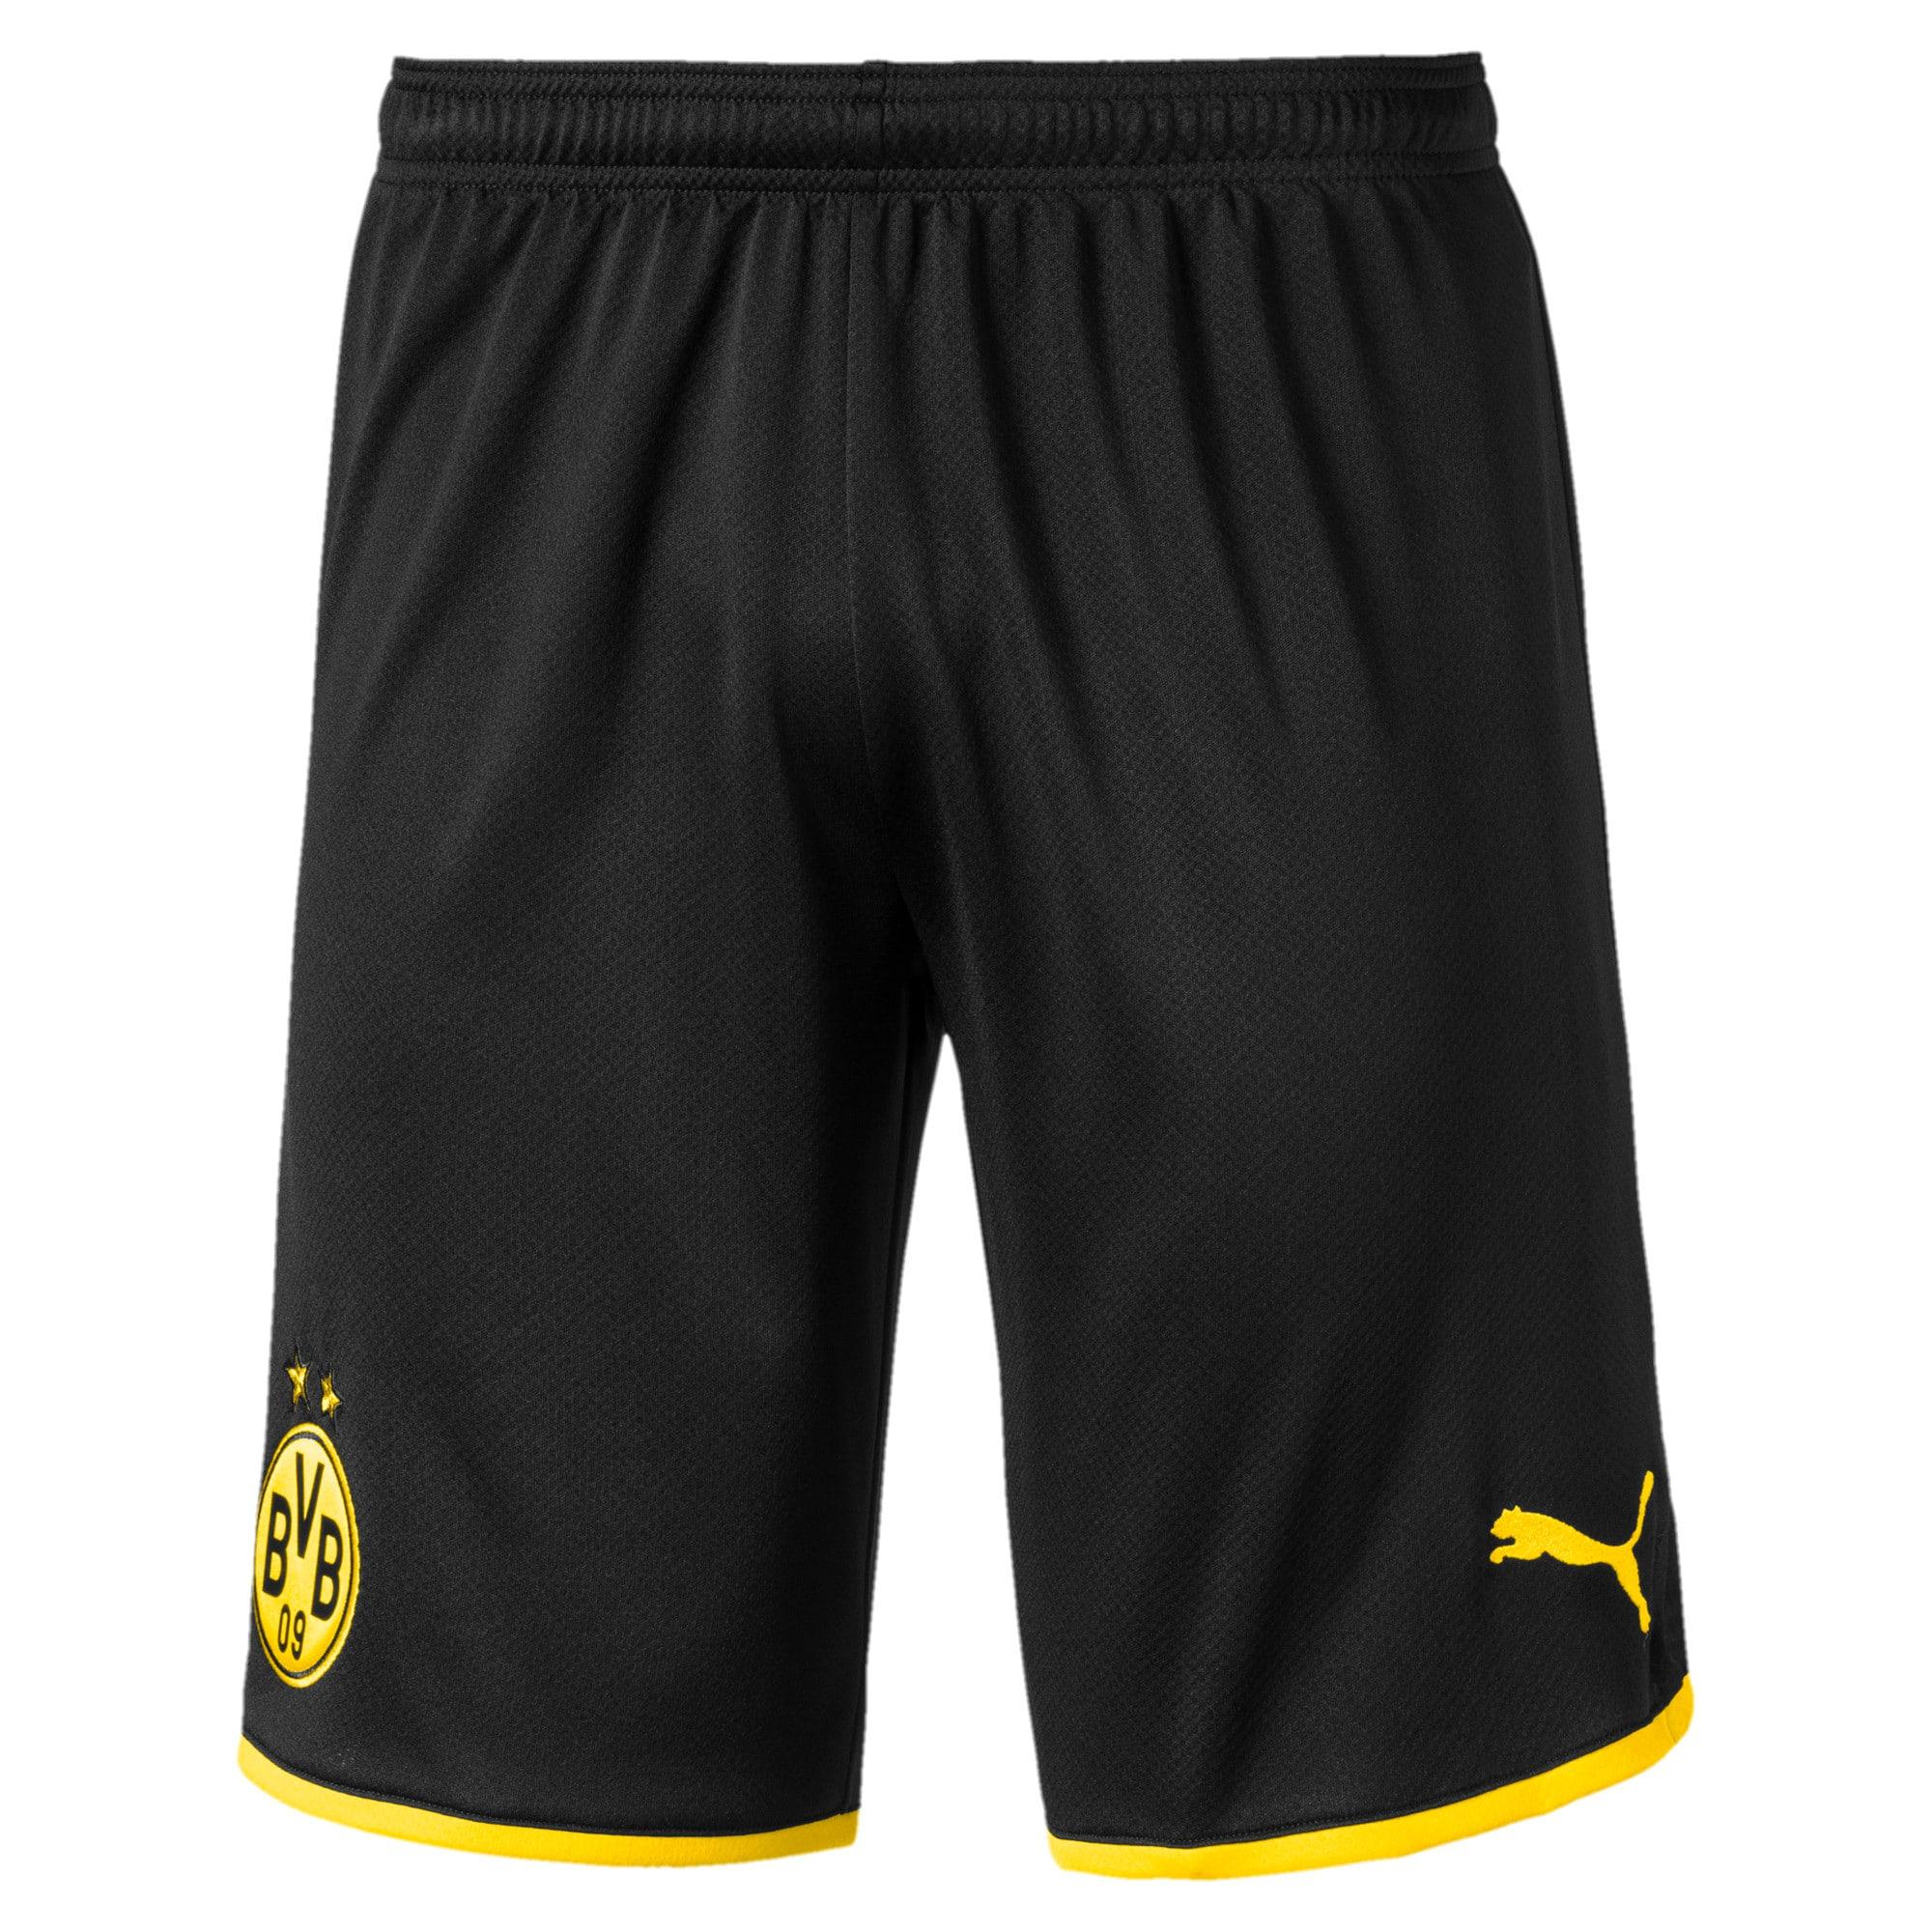 Thumbnail 1 of BVB Men's Away Replica Shorts, Puma Black-Cyber Yellow, medium